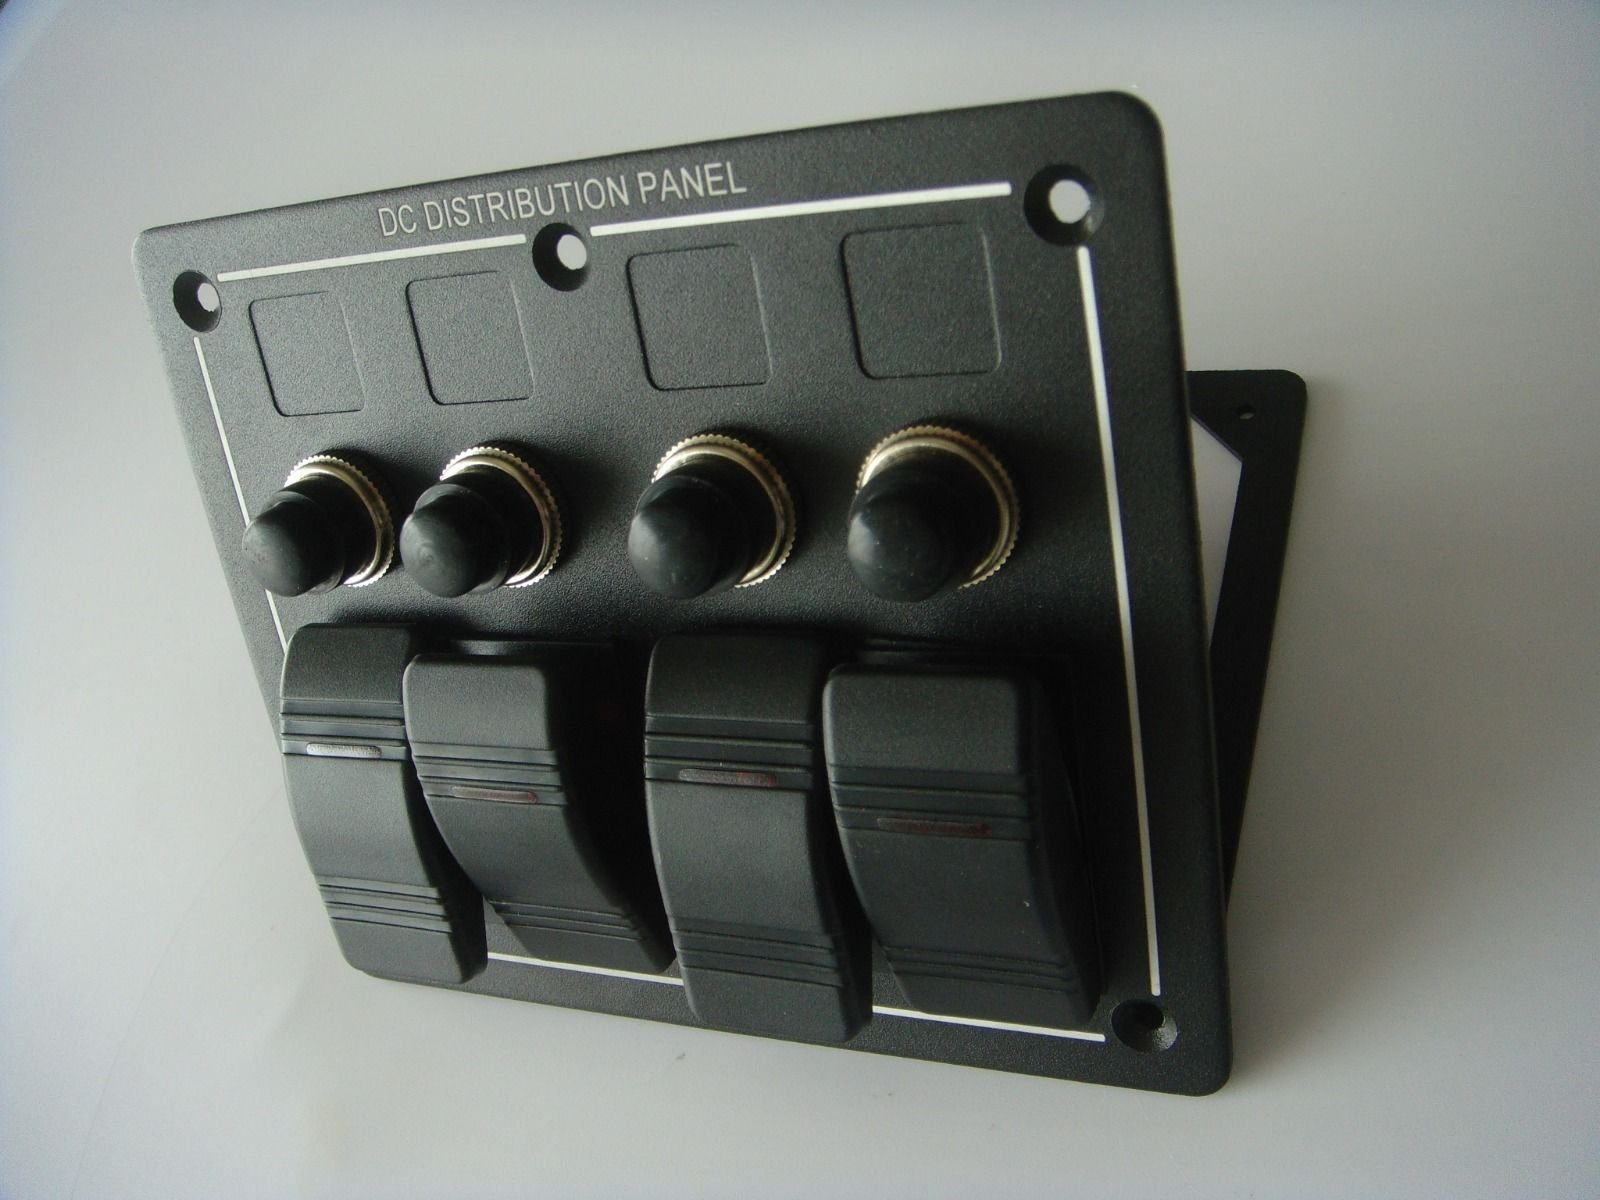 Amarine-made 4 Gang Aluminium LED Rocker & Circuit Breaker Waterproof Marine Boat Rv Switch Panel